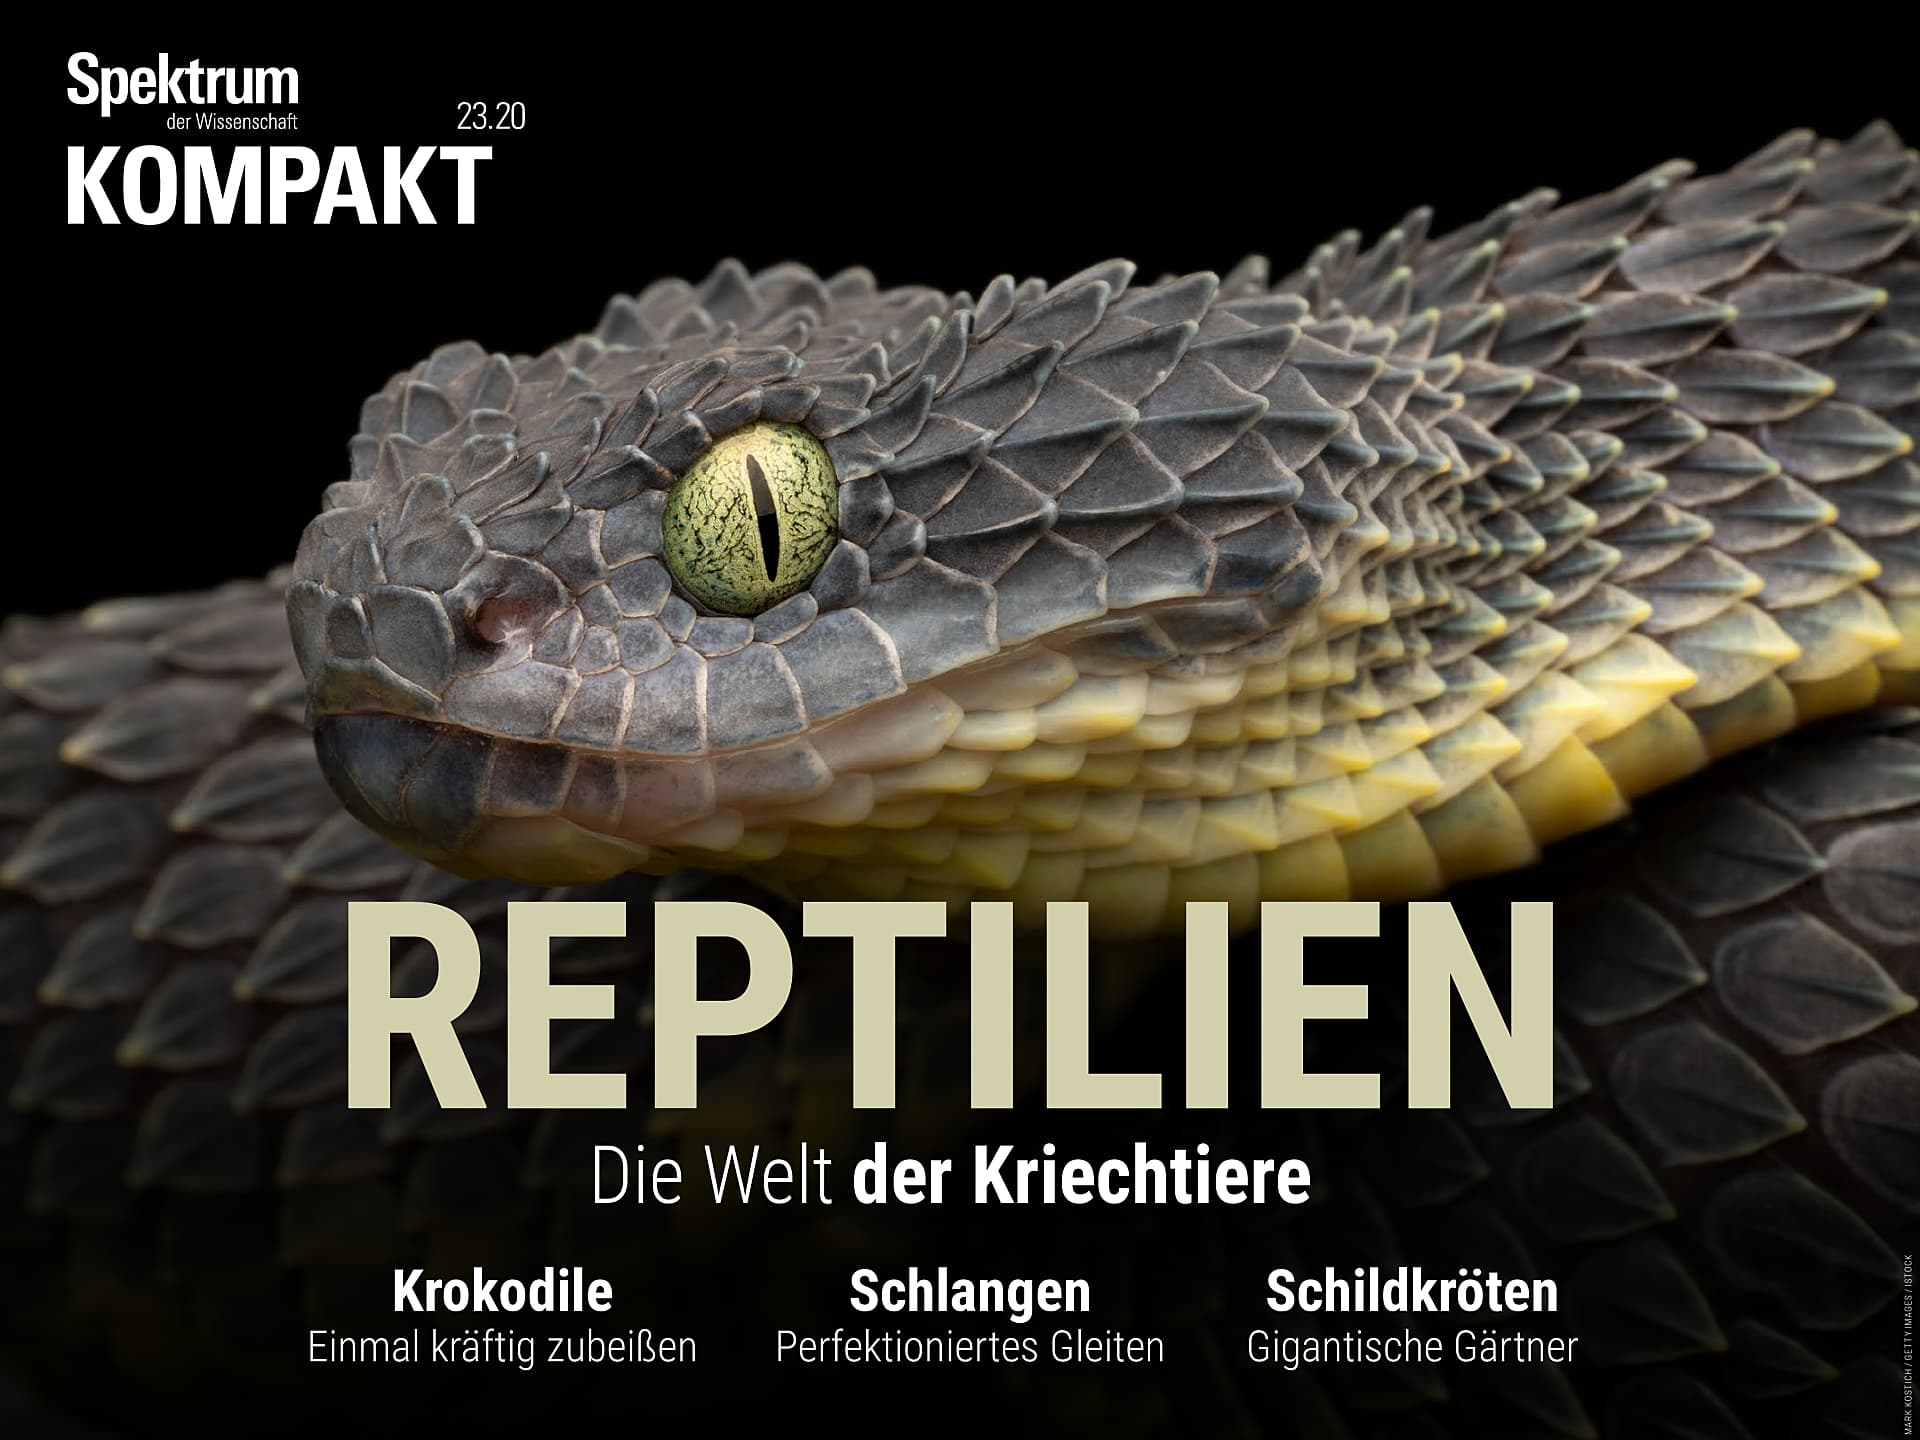 Reptilien - Die Welt der Kriechtiere